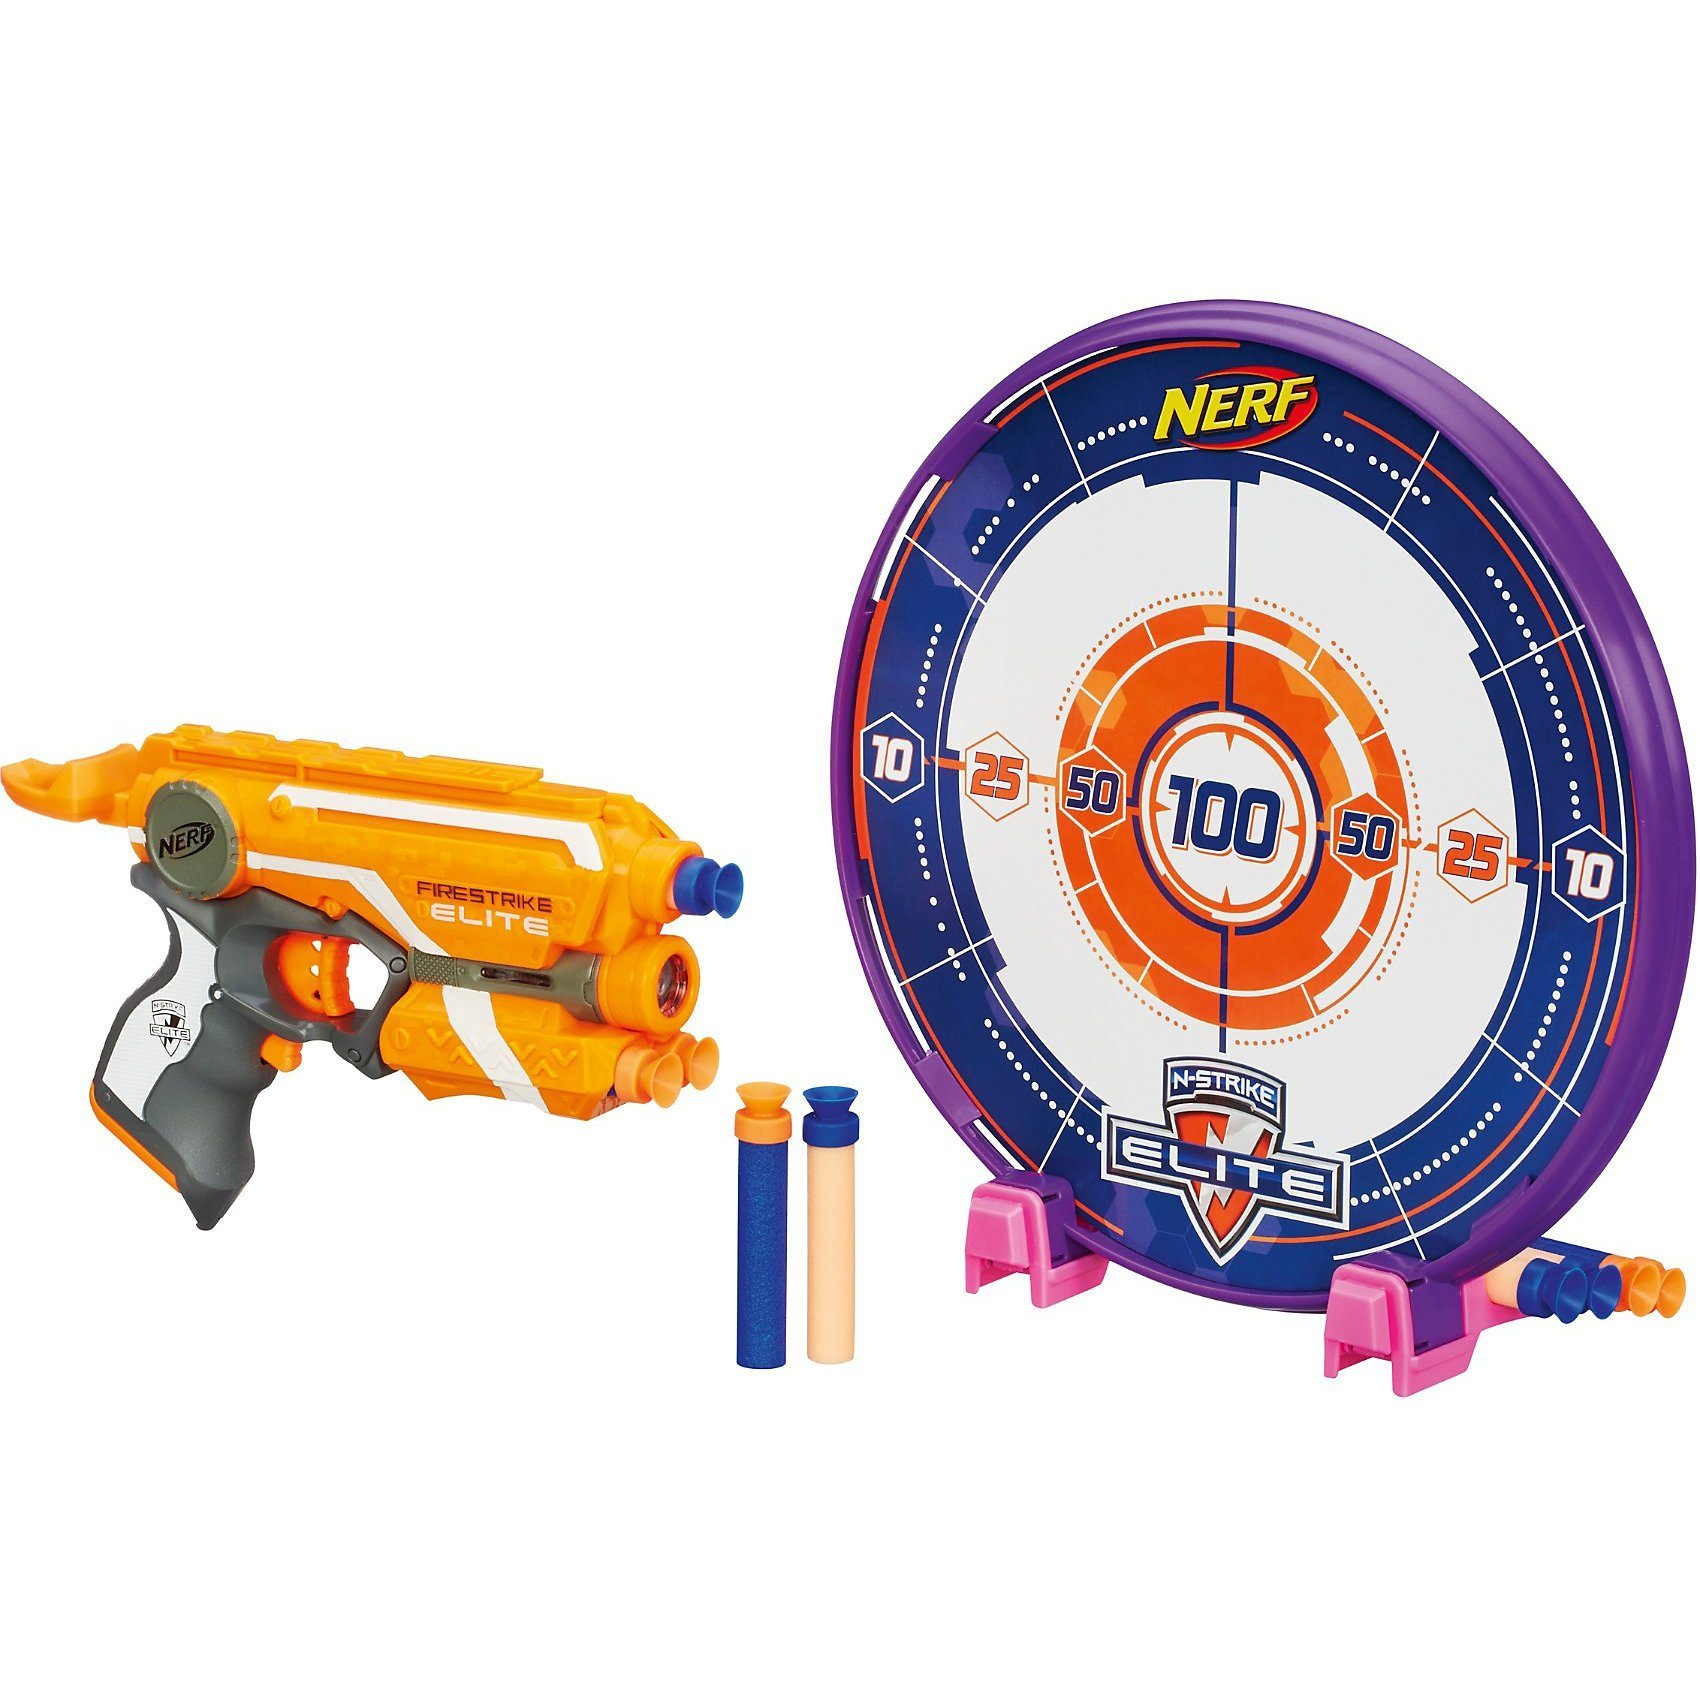 Hasbro NERF N-Strike Elite Precision Target Set